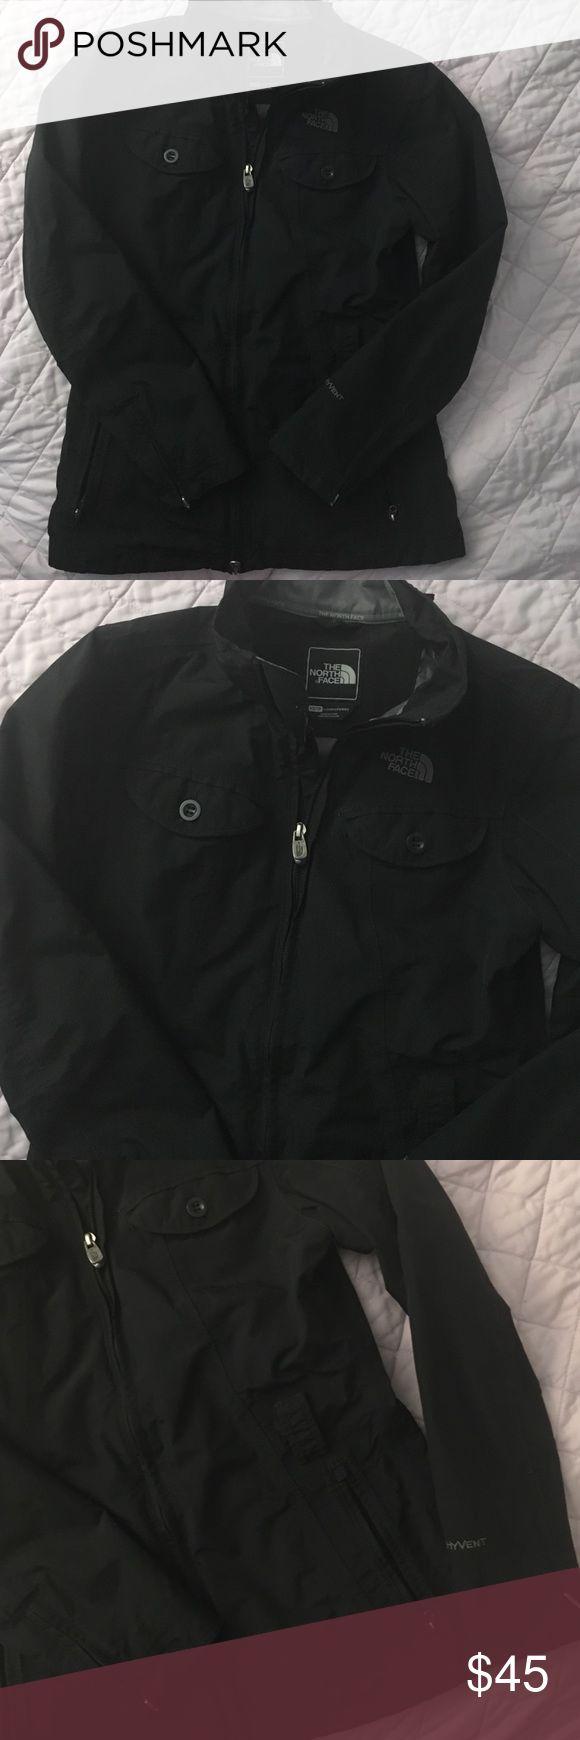 1000  ideas about Black Rain Jacket on Pinterest | Black north